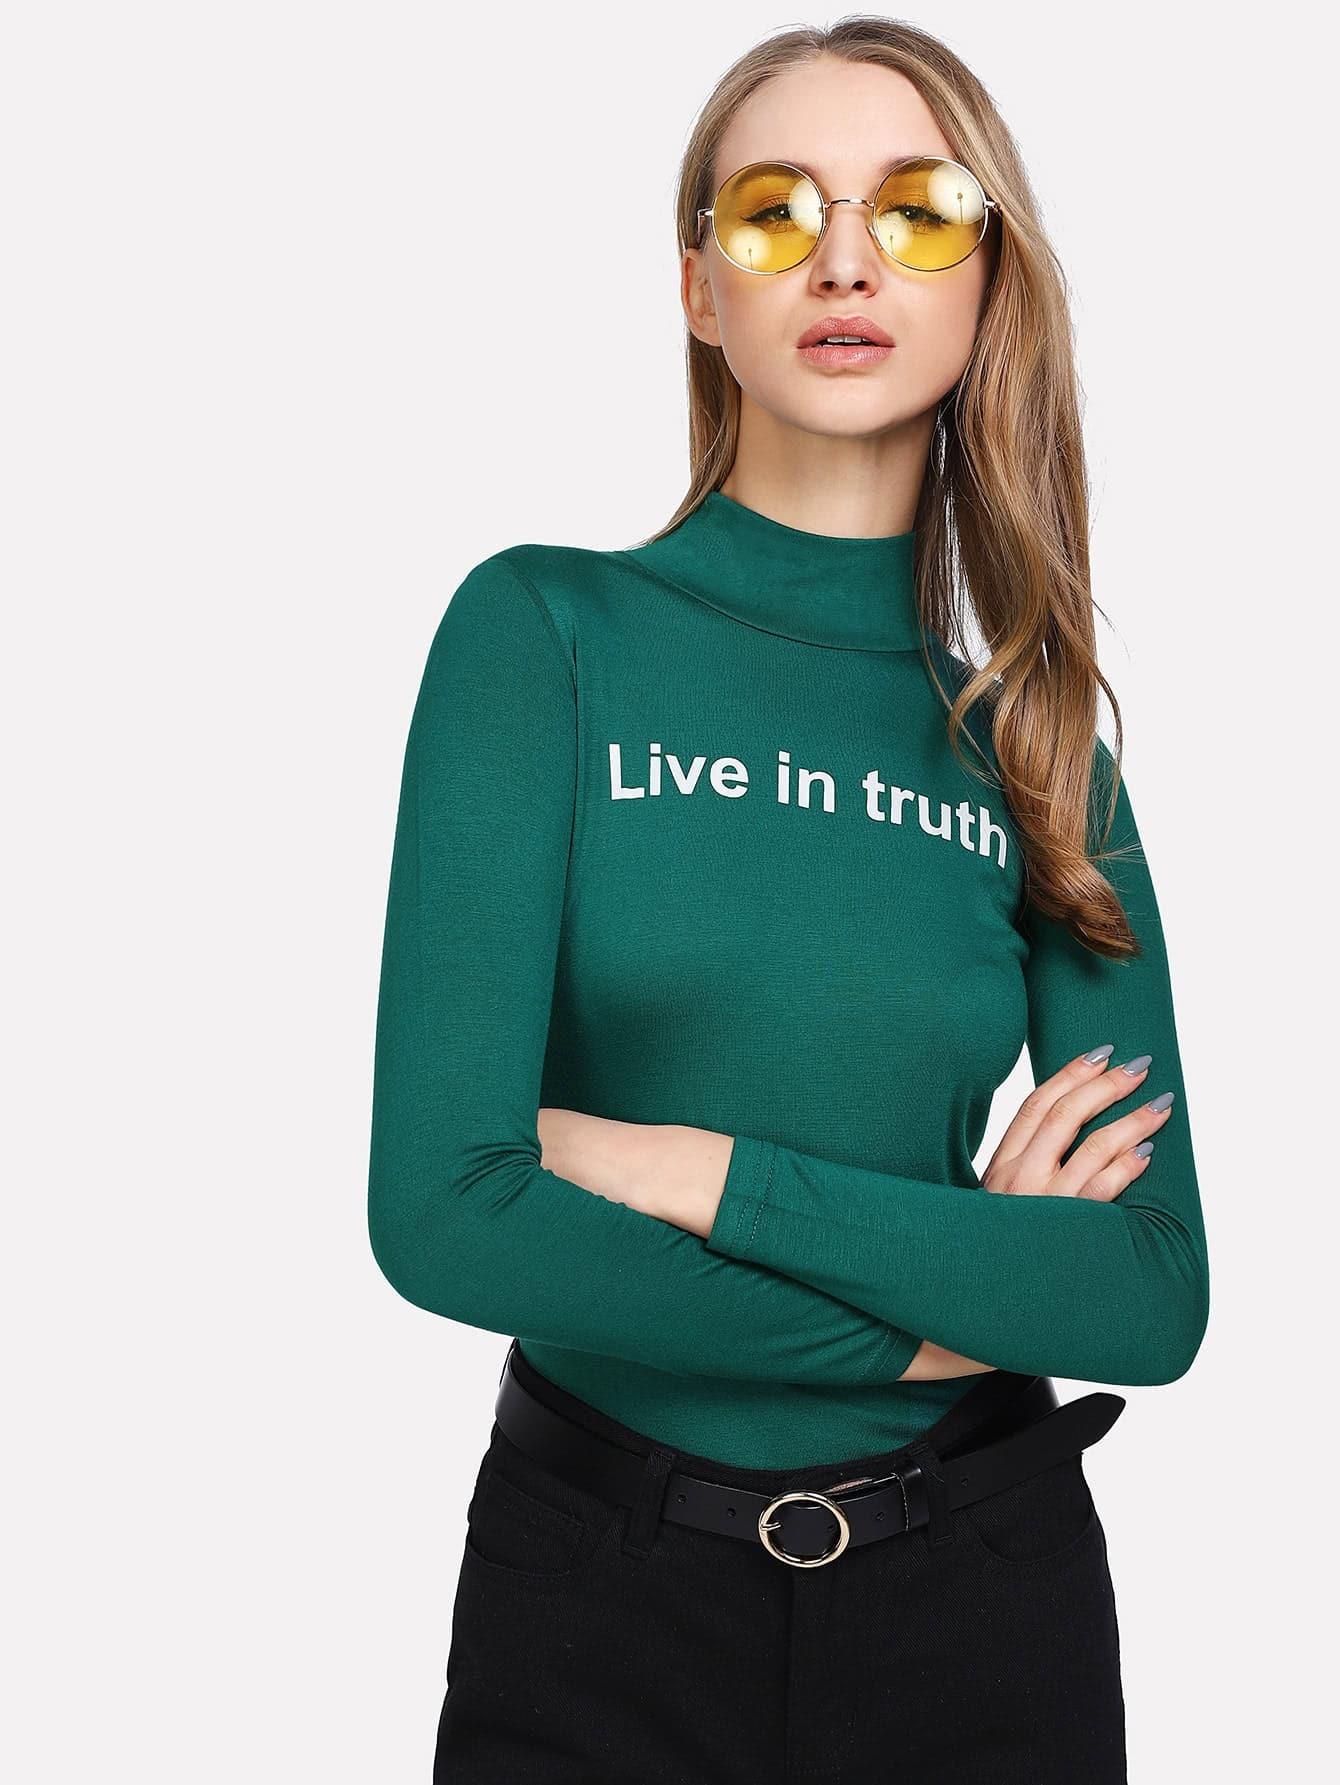 High Neck Slogan Print T-shirt heather blue slogan print t shirt